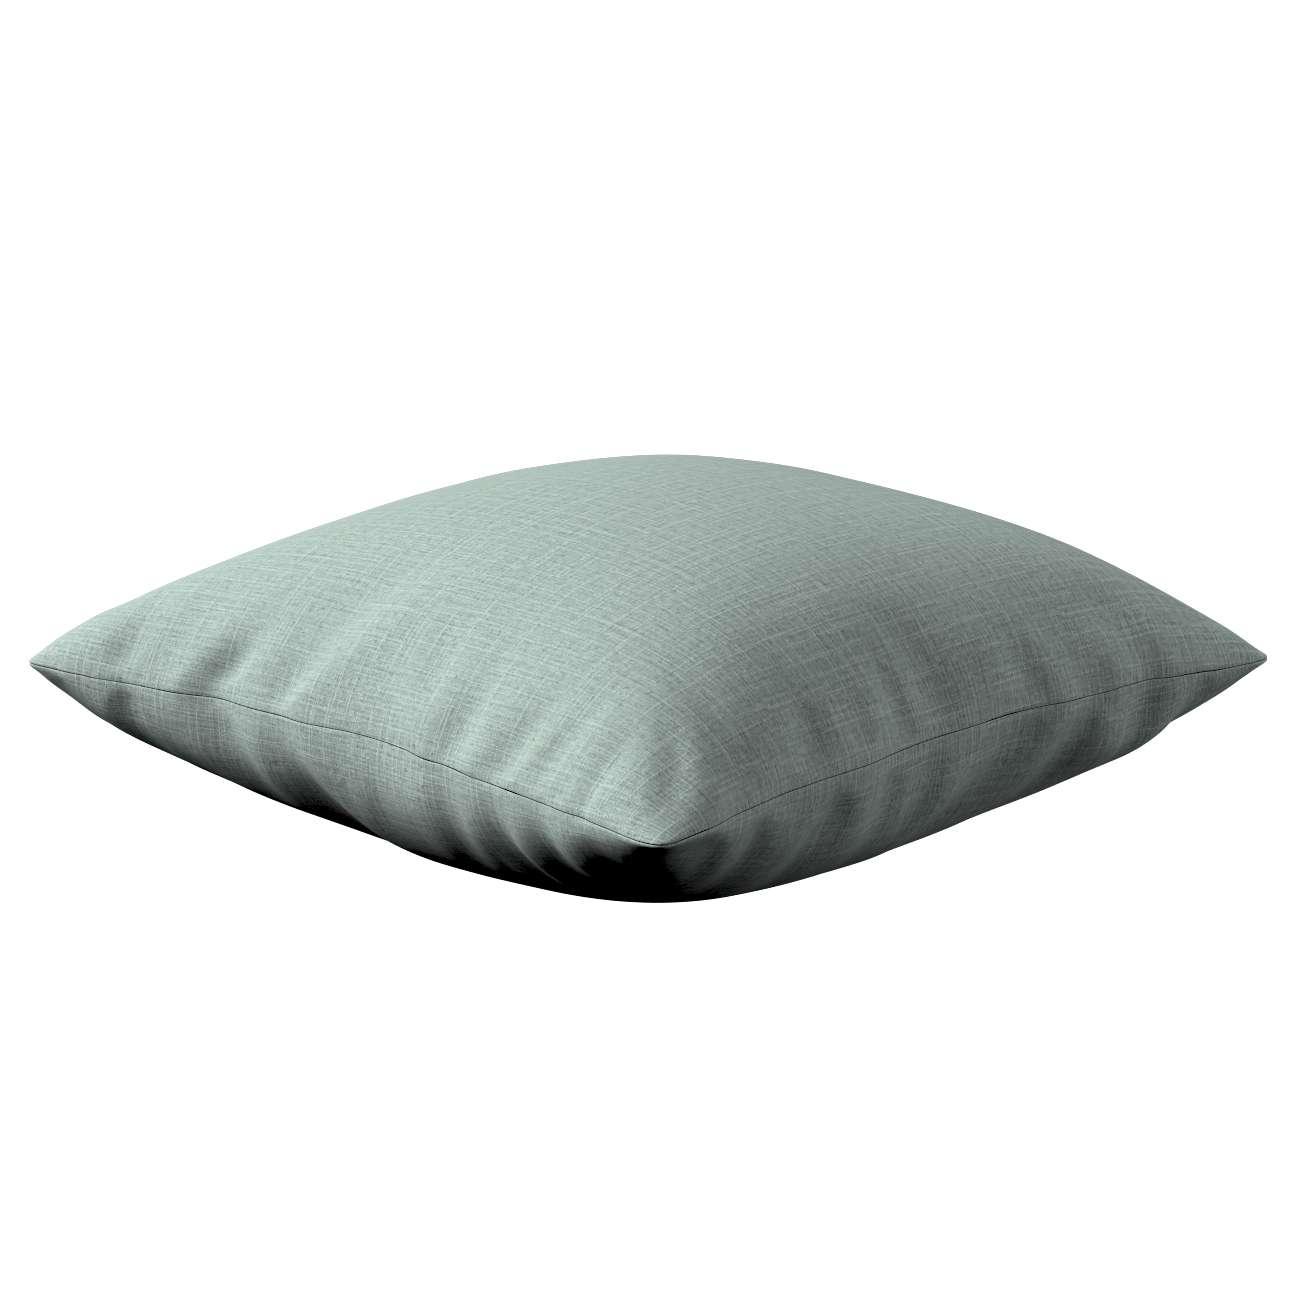 Kinga cushion cover in collection Living II, fabric: 160-86